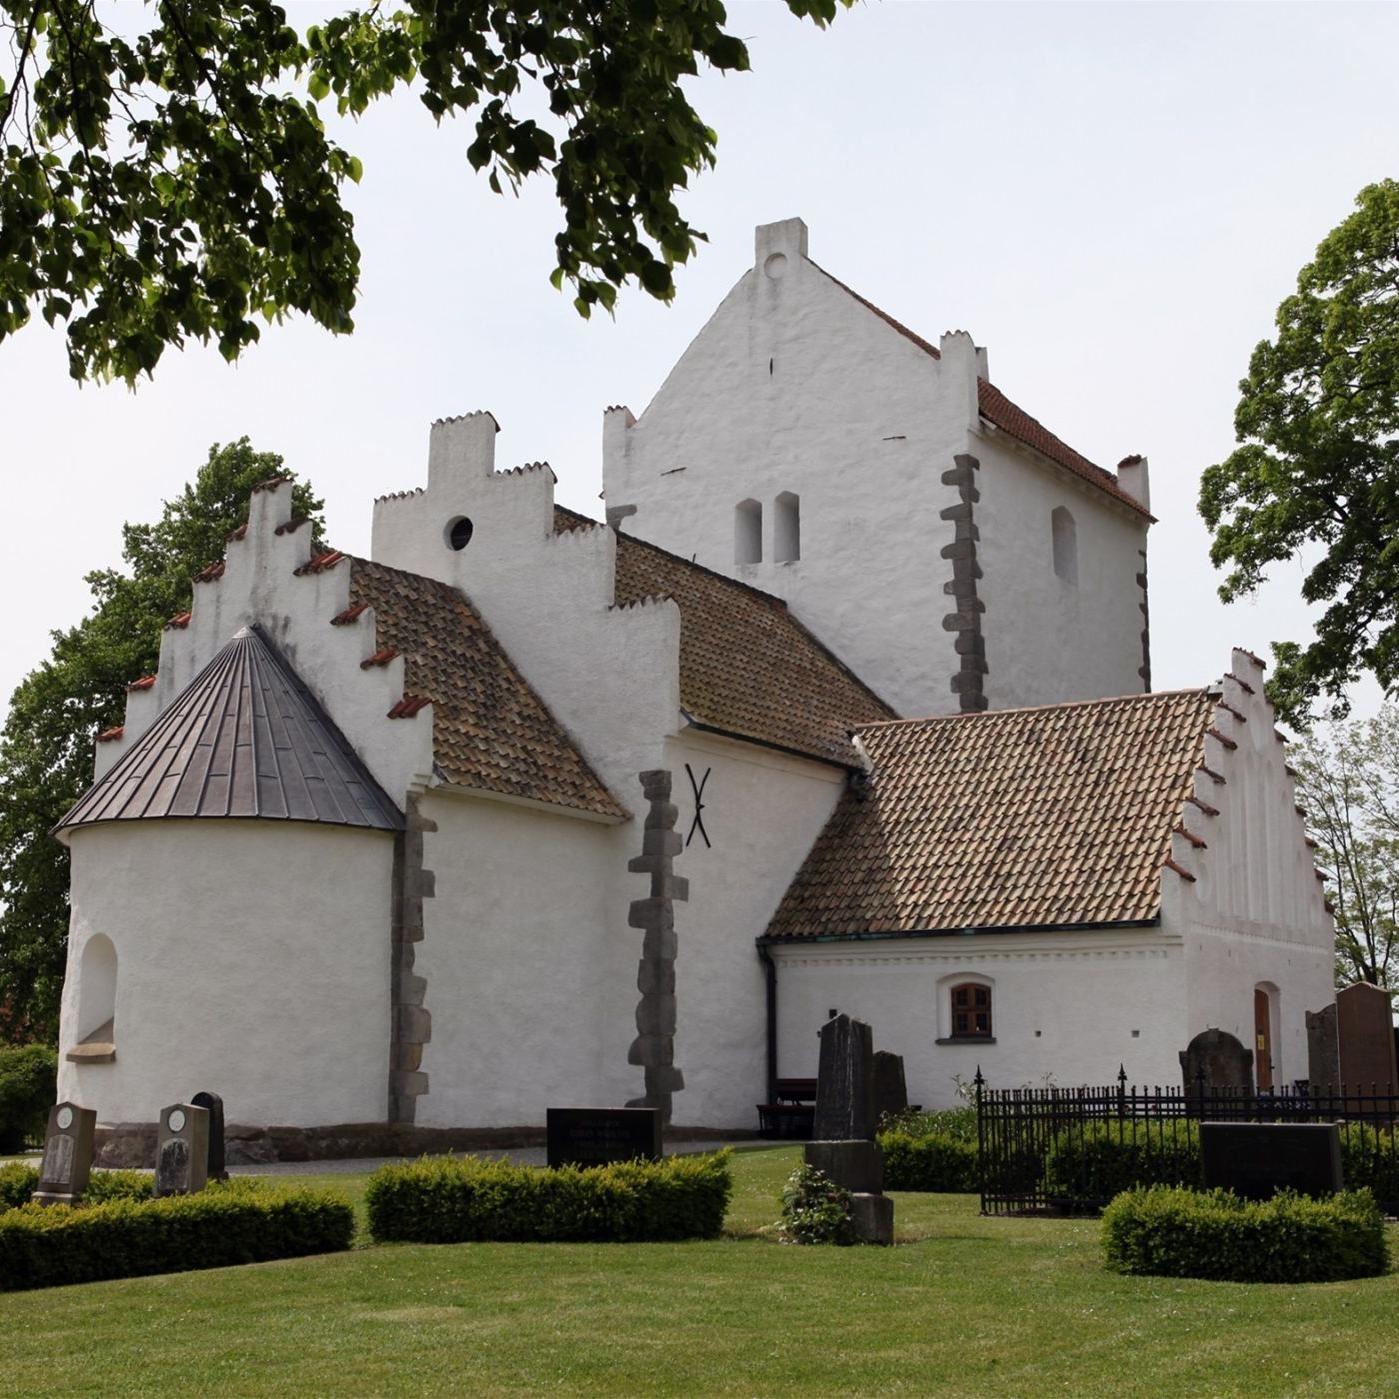 © Kävlinge kommun, Kävlinge alten Kirche